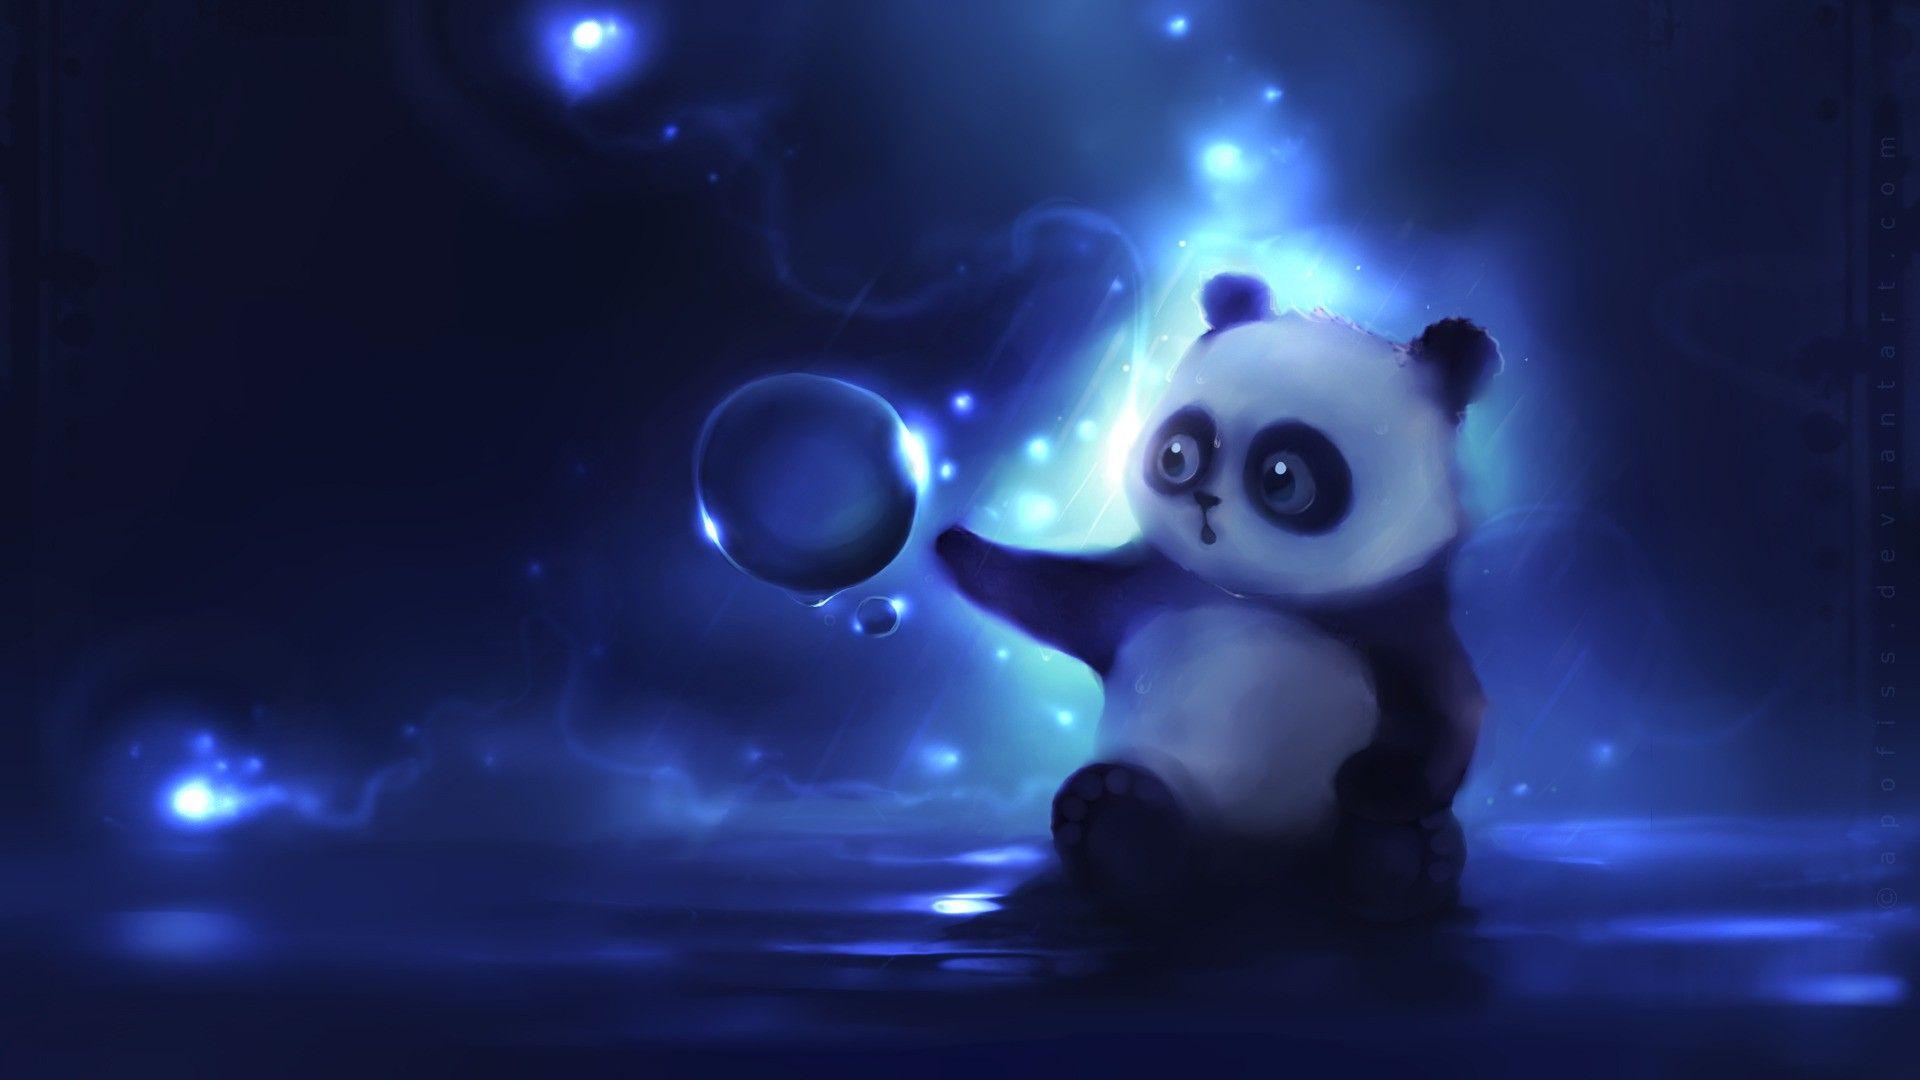 Panda Fonds D Ecran Arrieres Plan 1920x1080 Id 361513 Fond D Ecran Dessin Anime Fond D Ecran Frais Fond D Ecran Sympa